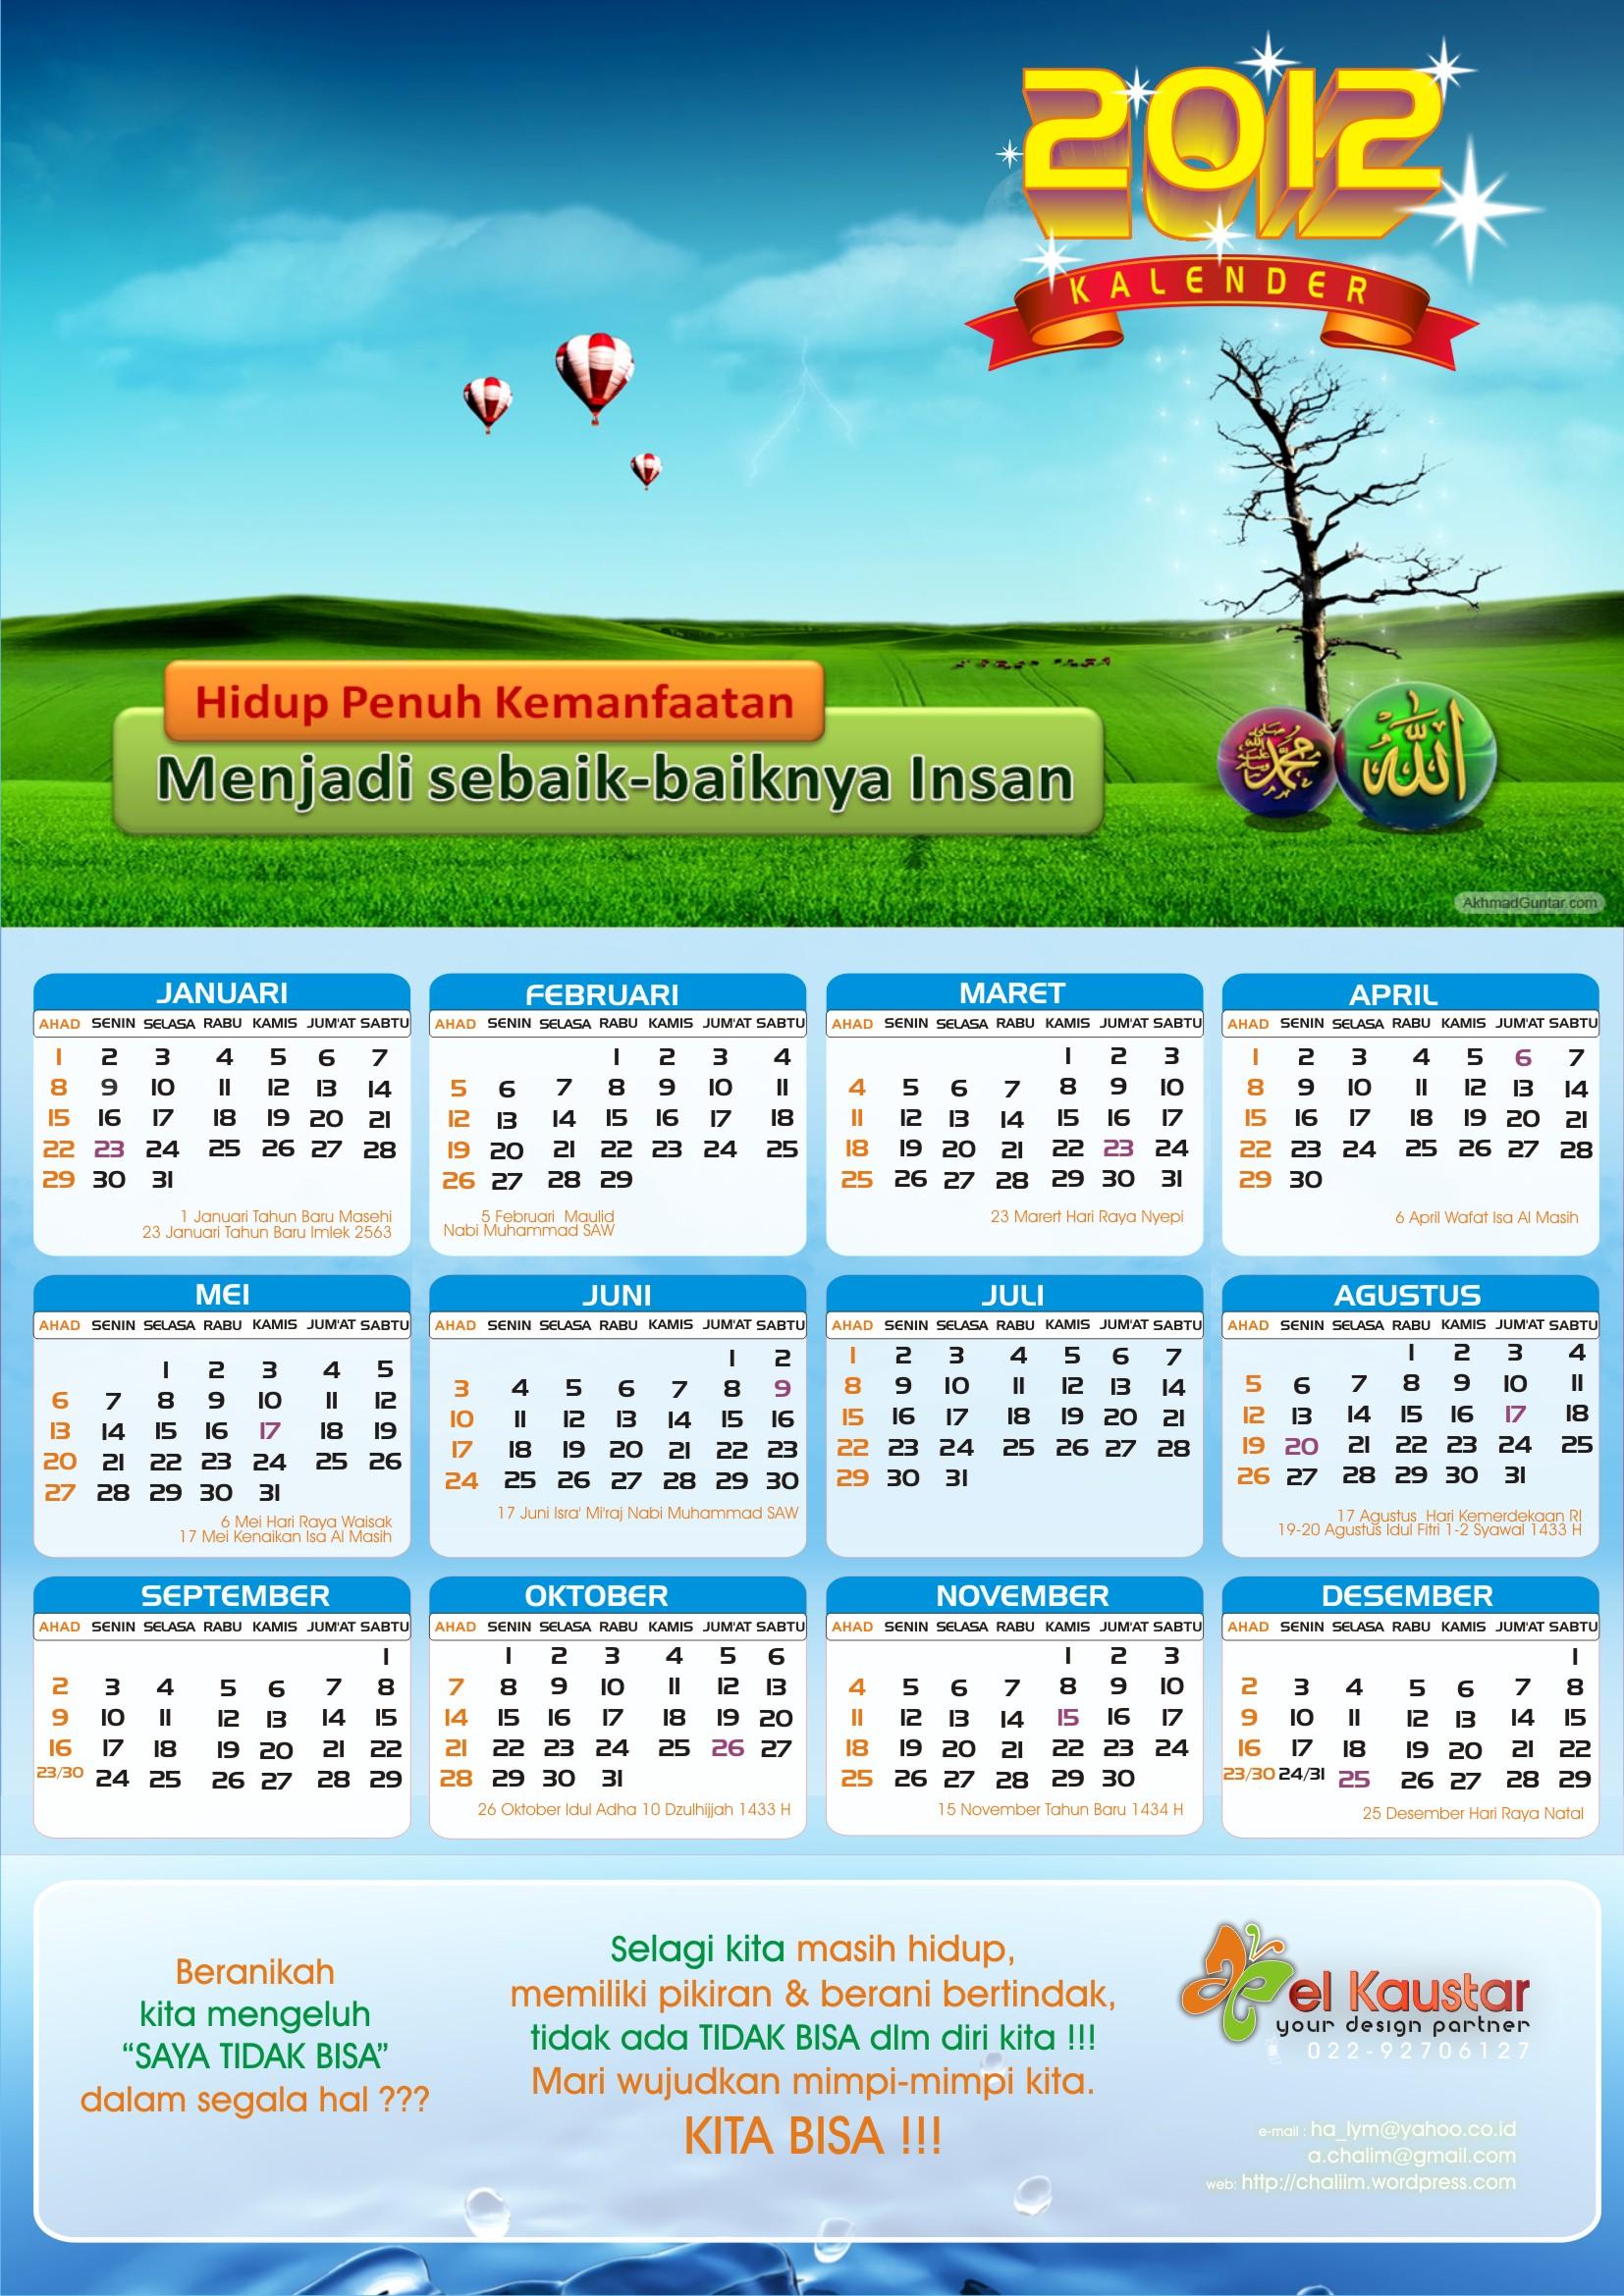 ... dg hari libur SKB 3 Menteri – kalender kata-kata motivasi_biru hijau